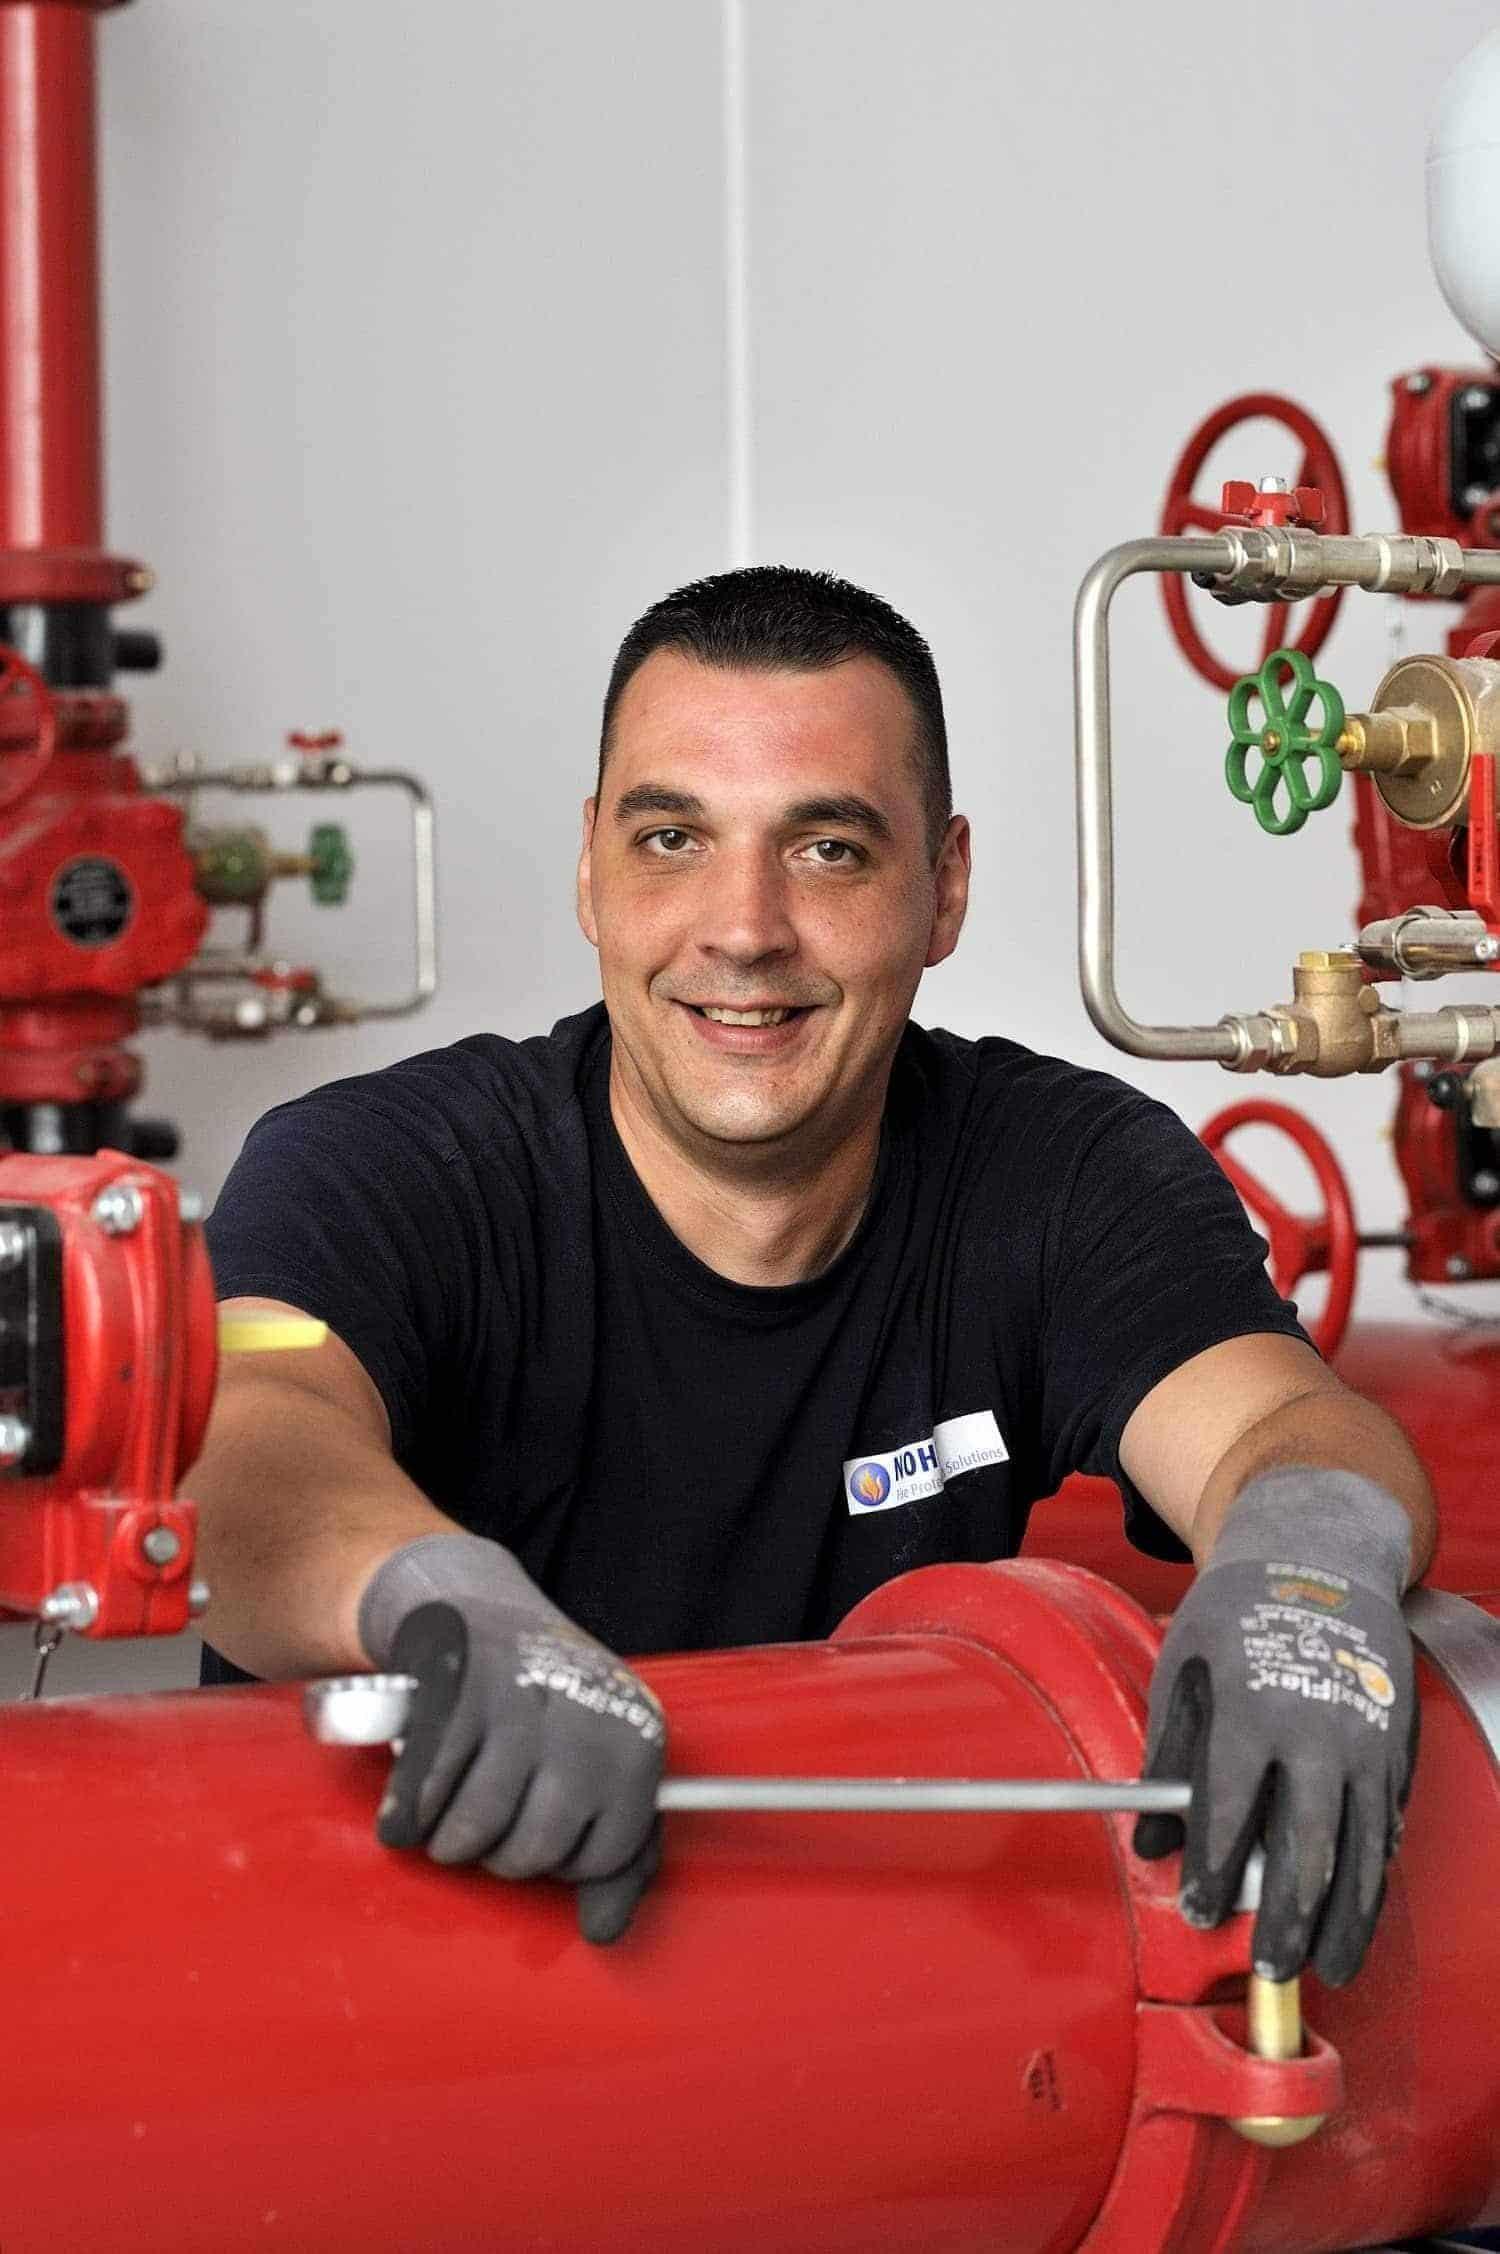 Nohl Brandschutz Servicemonteur